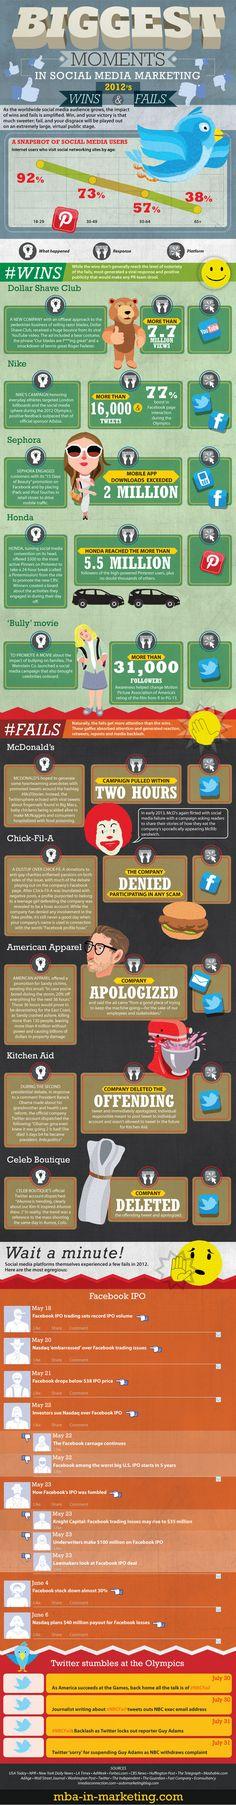 Social media FAIL infographic.